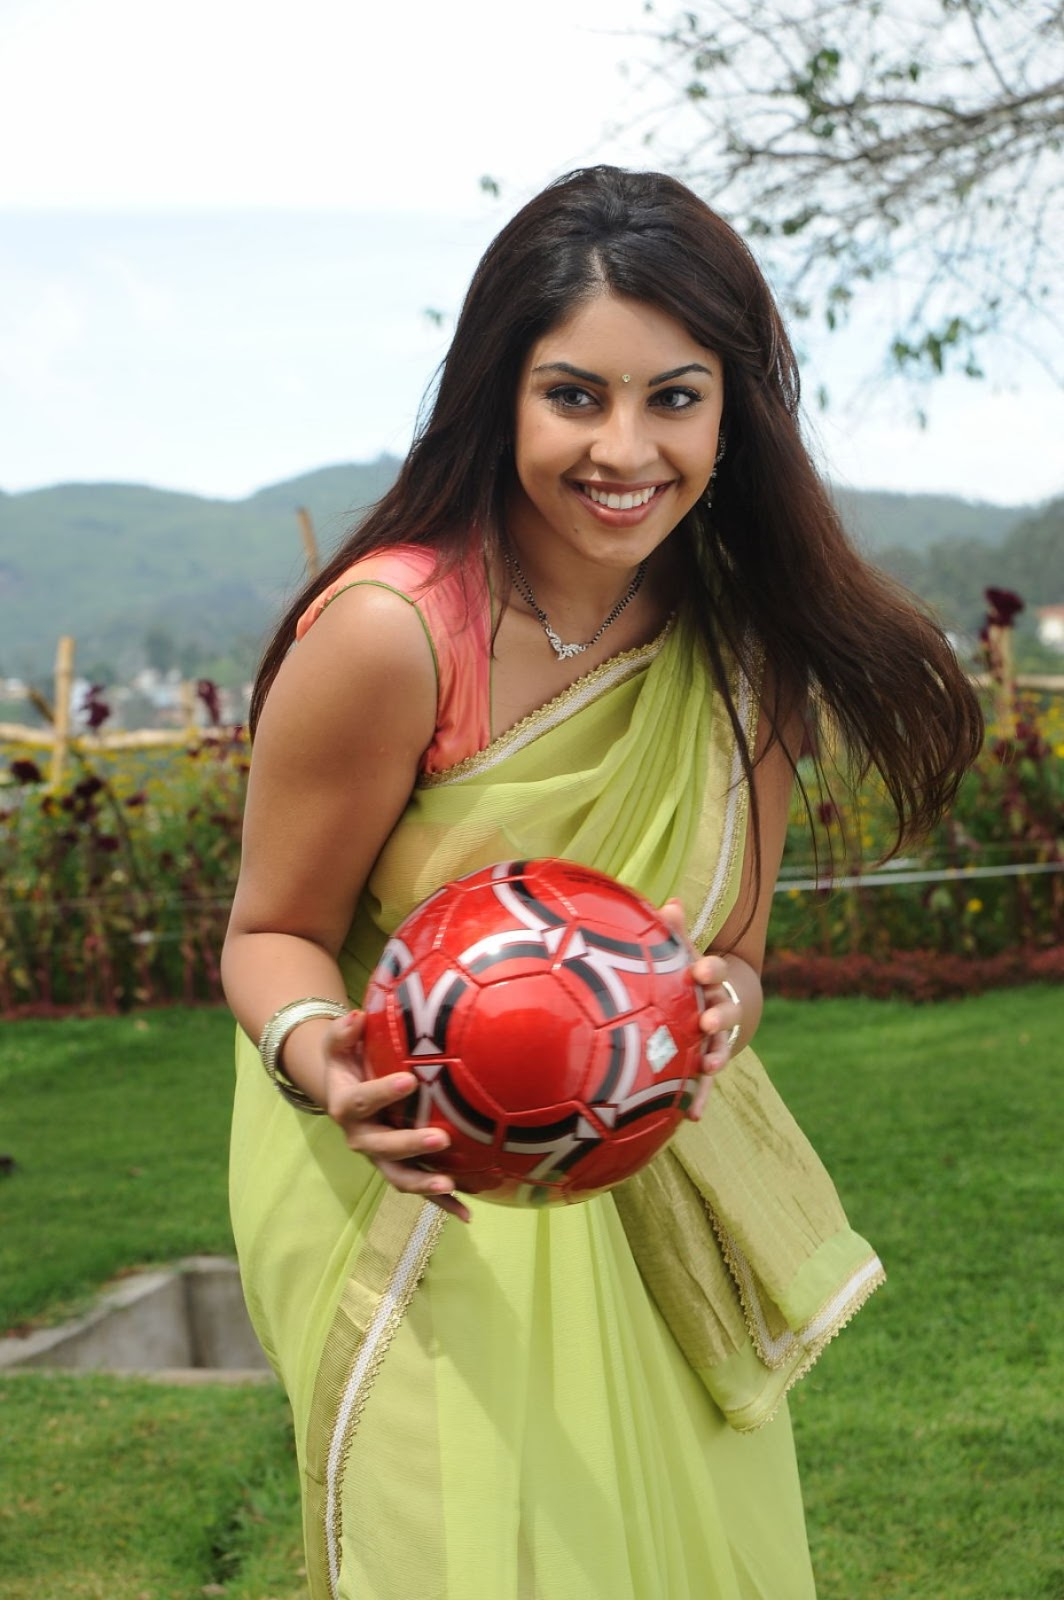 Blooming Richa gangopadhyay playing in saree